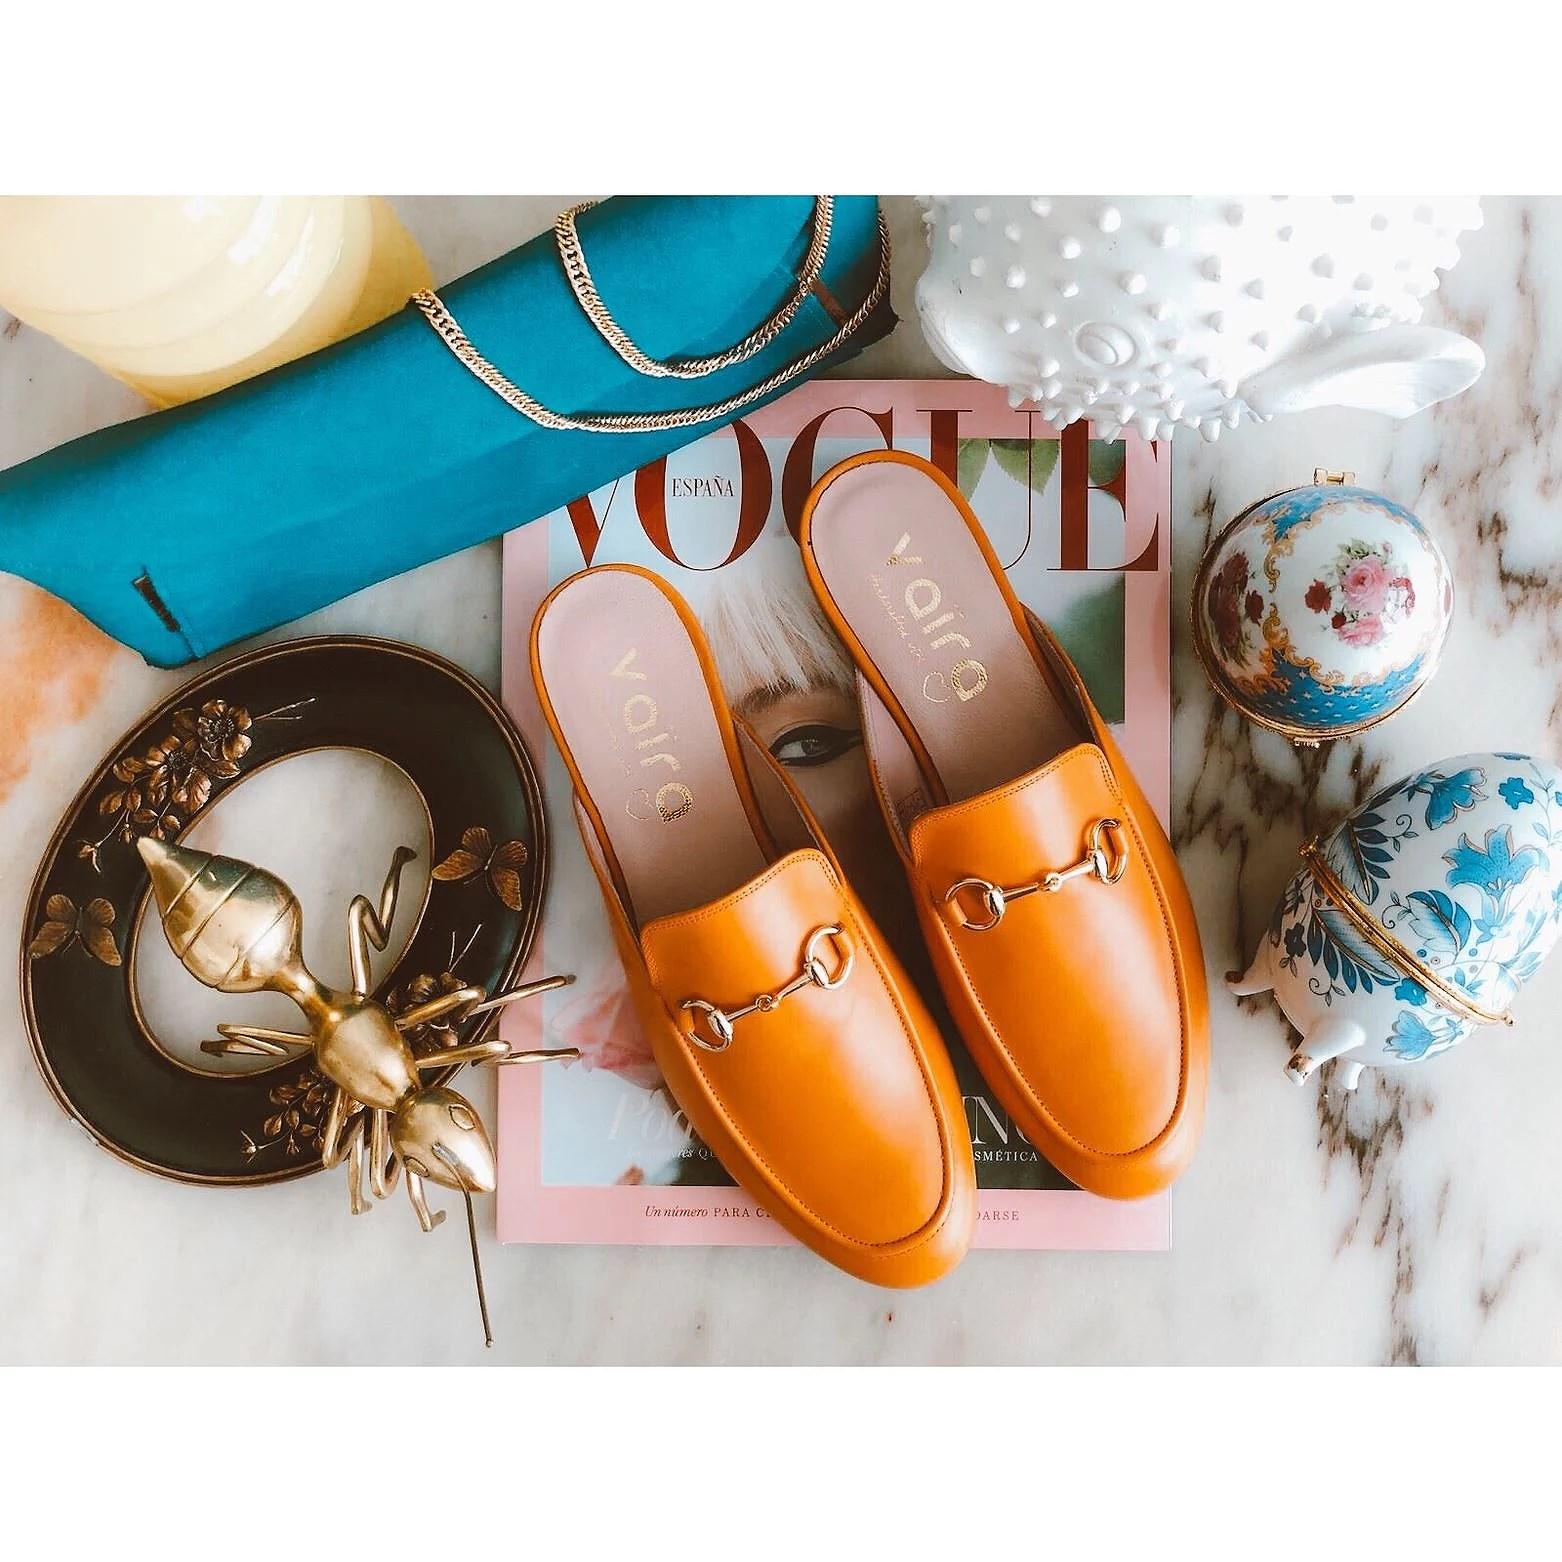 Monday with orange shoes